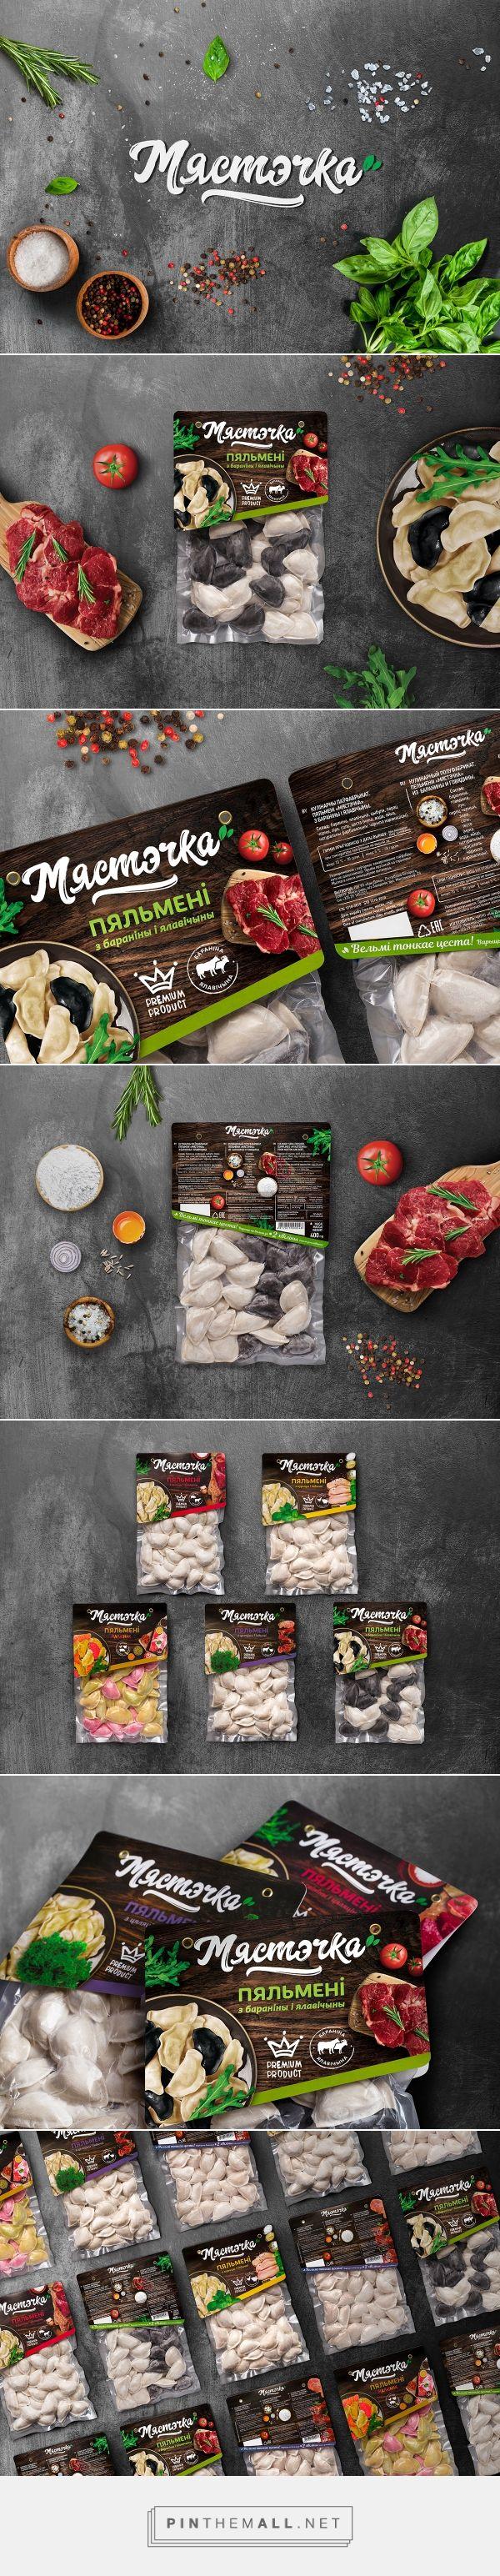 Myastechka - Packaging of the World - Creative Package Design Gallery - http://www.packagingoftheworld.com/2017/11/myastechka.html